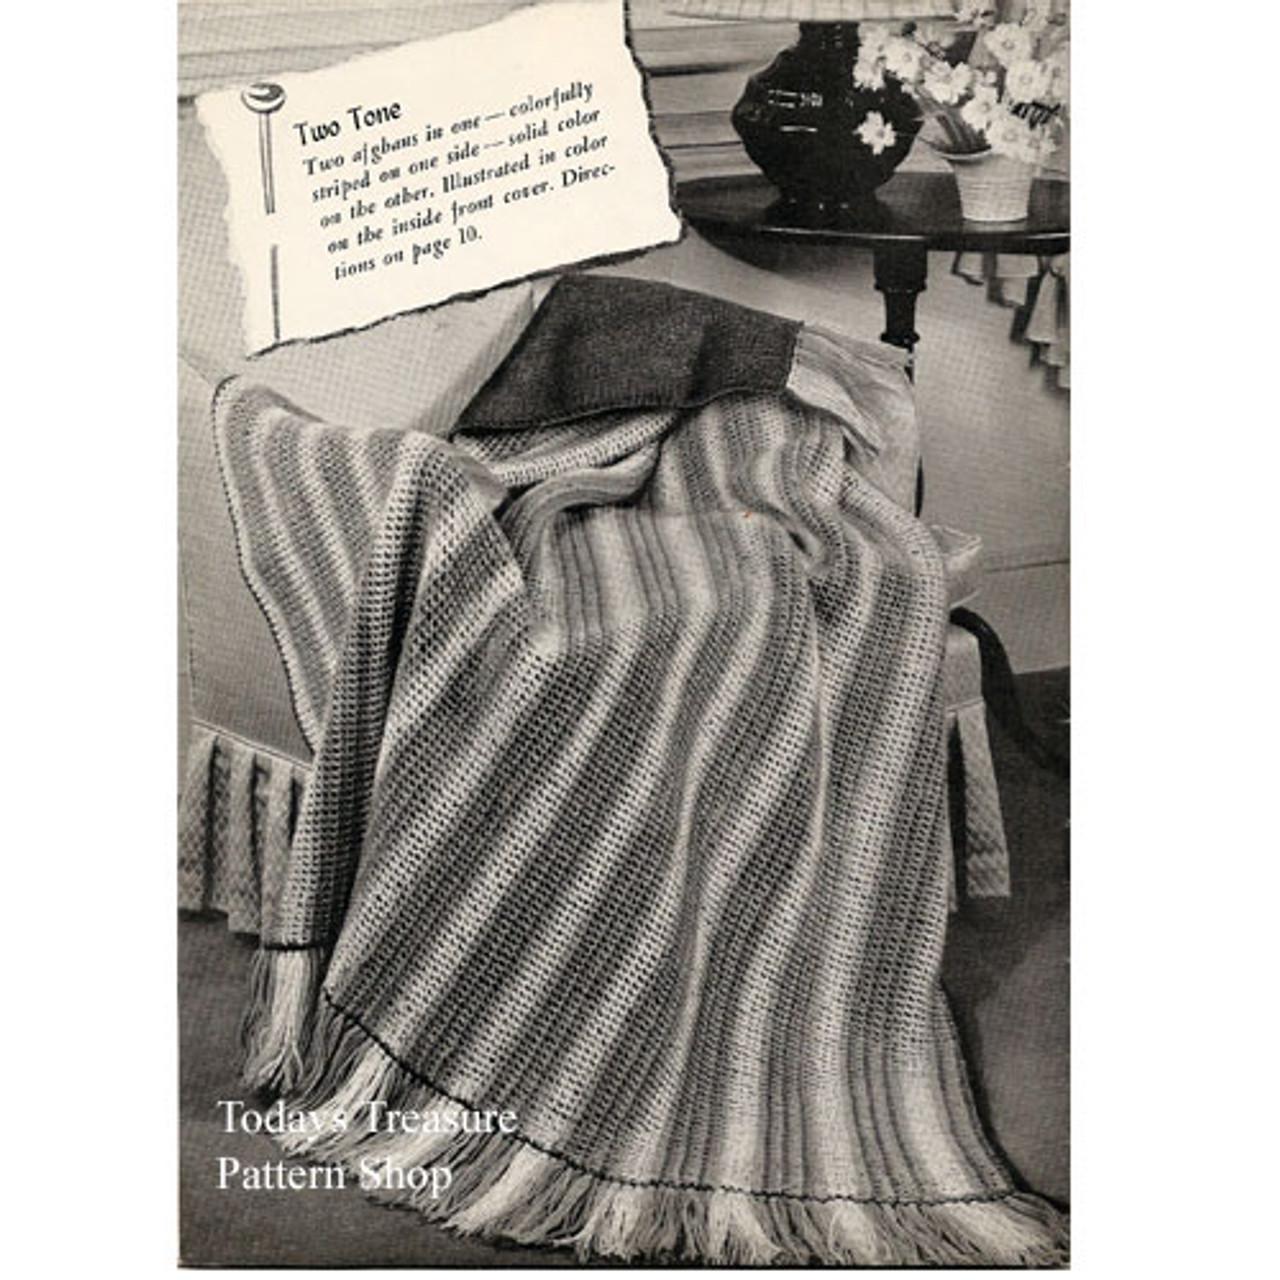 Vintage American Thread Striped Afghan Patter